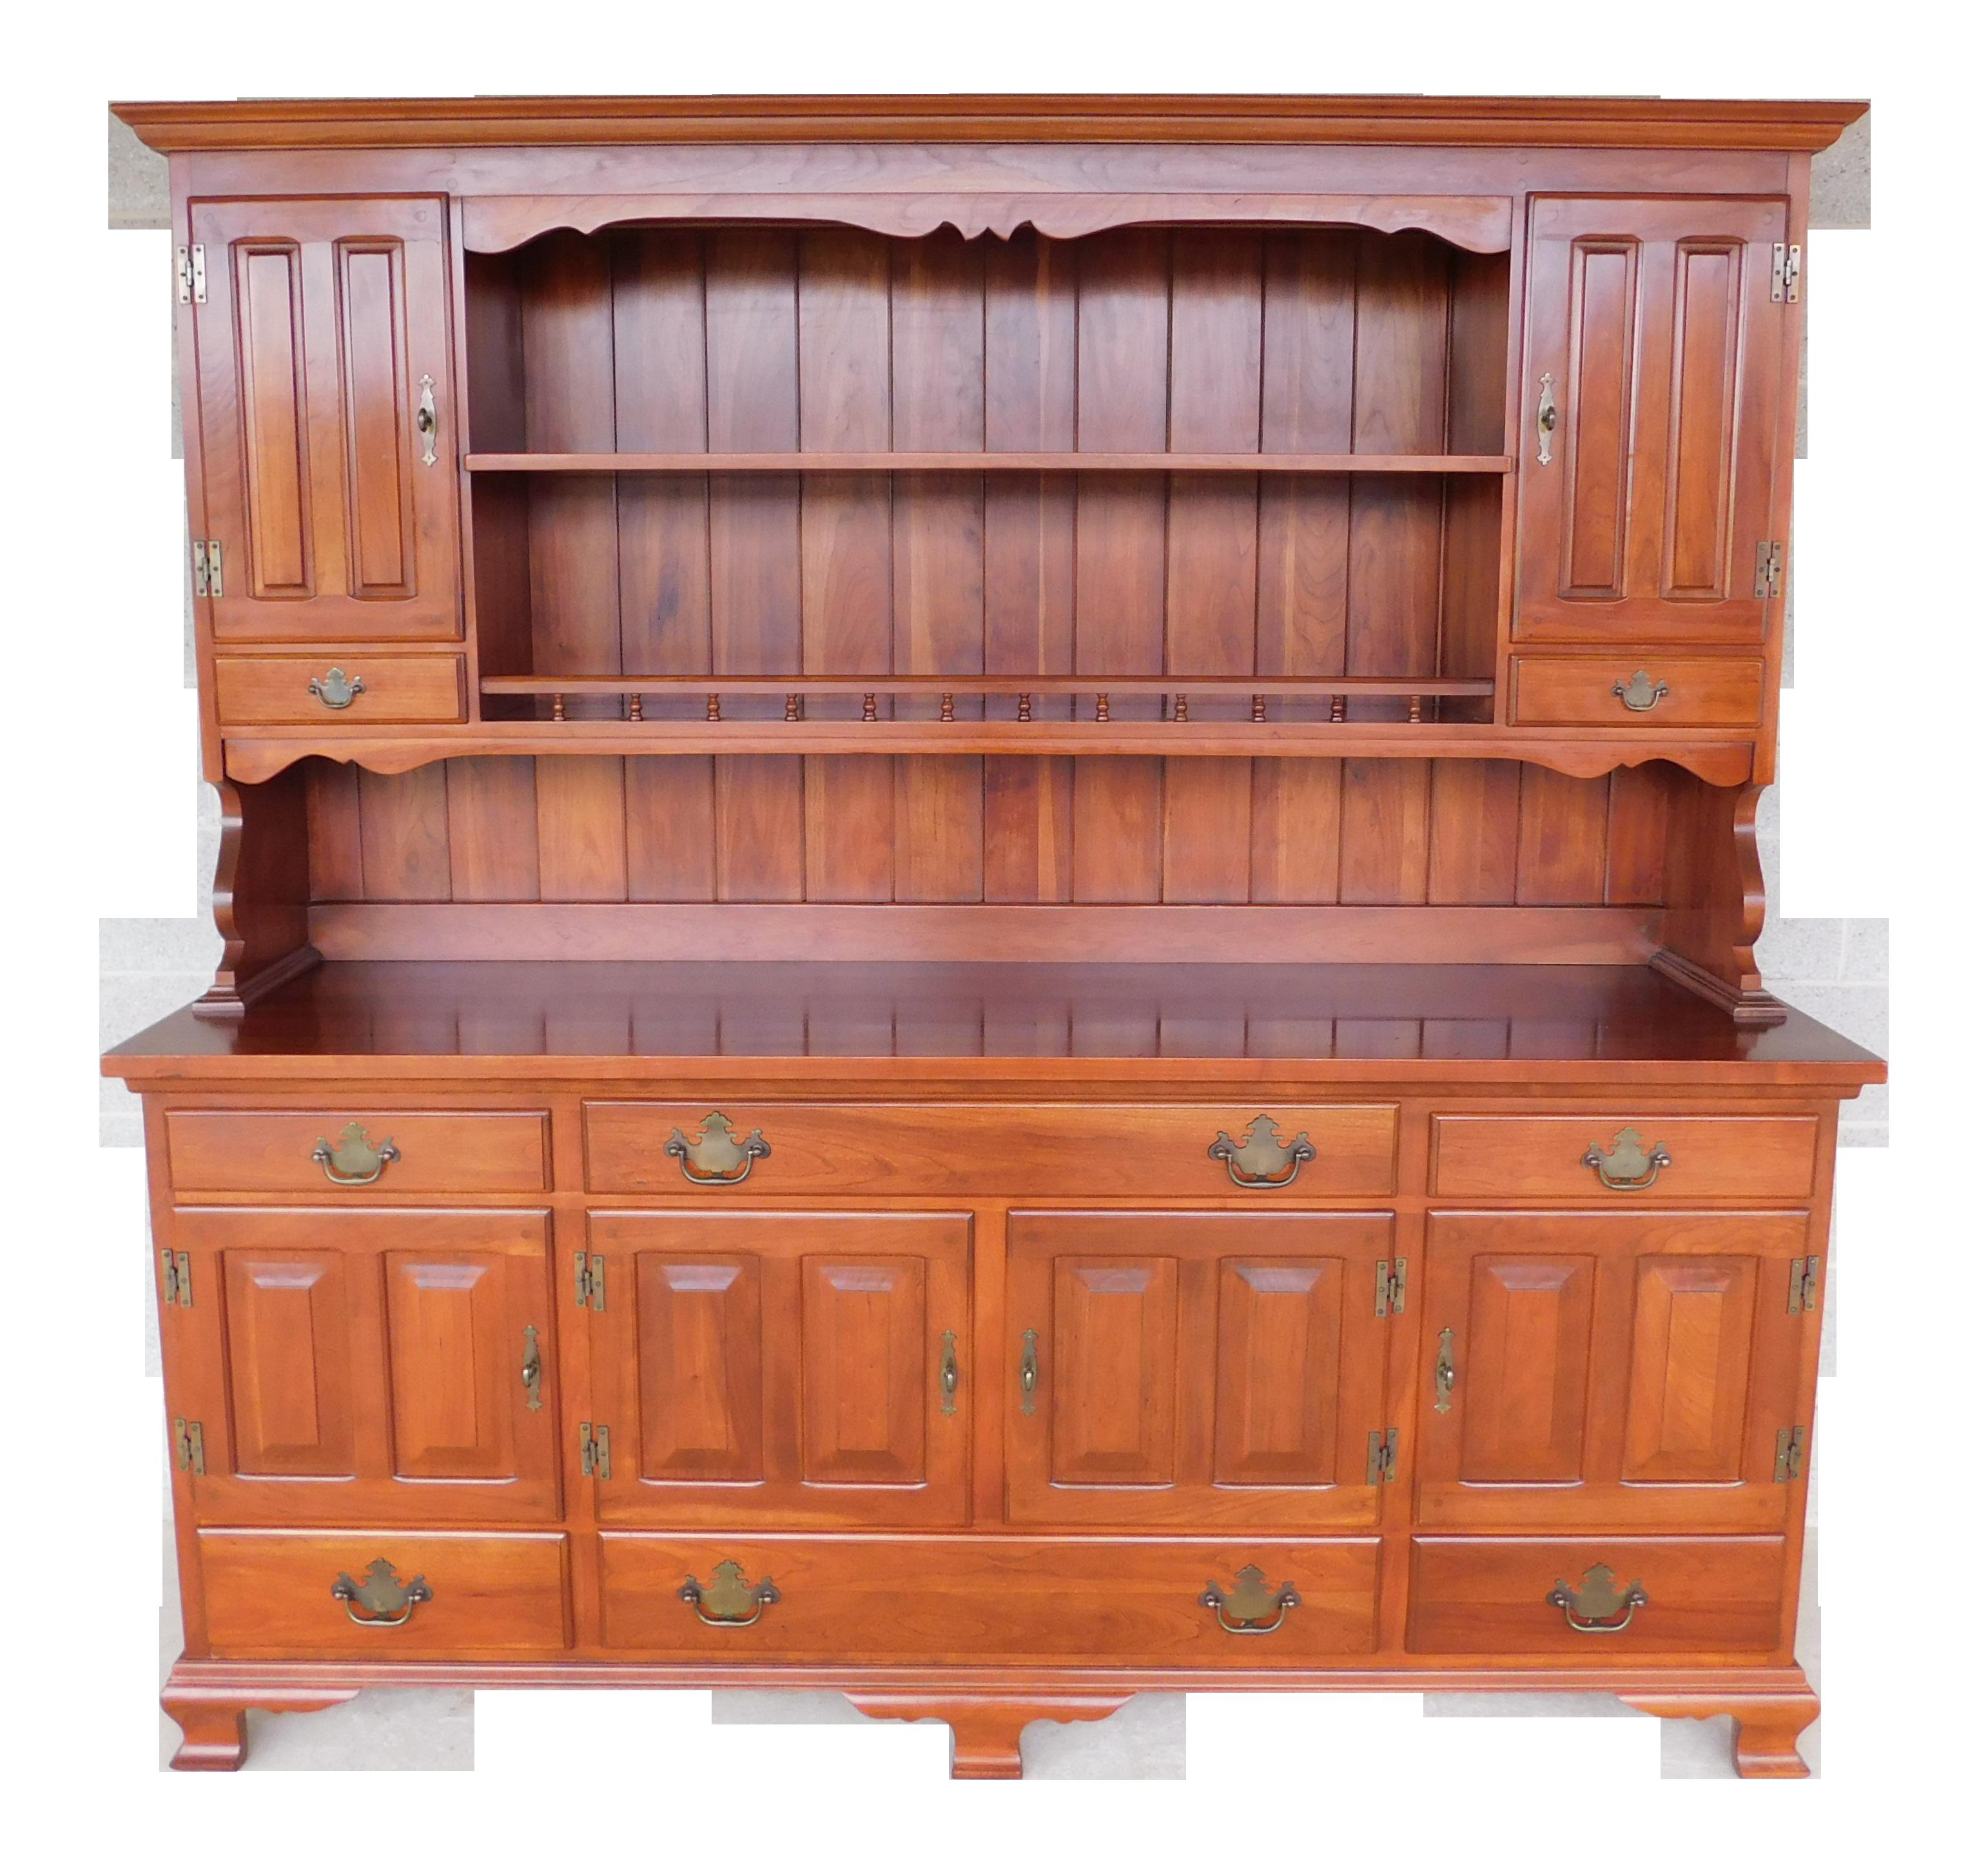 Harden Furniture Vintage 2pc Cherry Pewter Hutch Cabinet 75 W Chairish